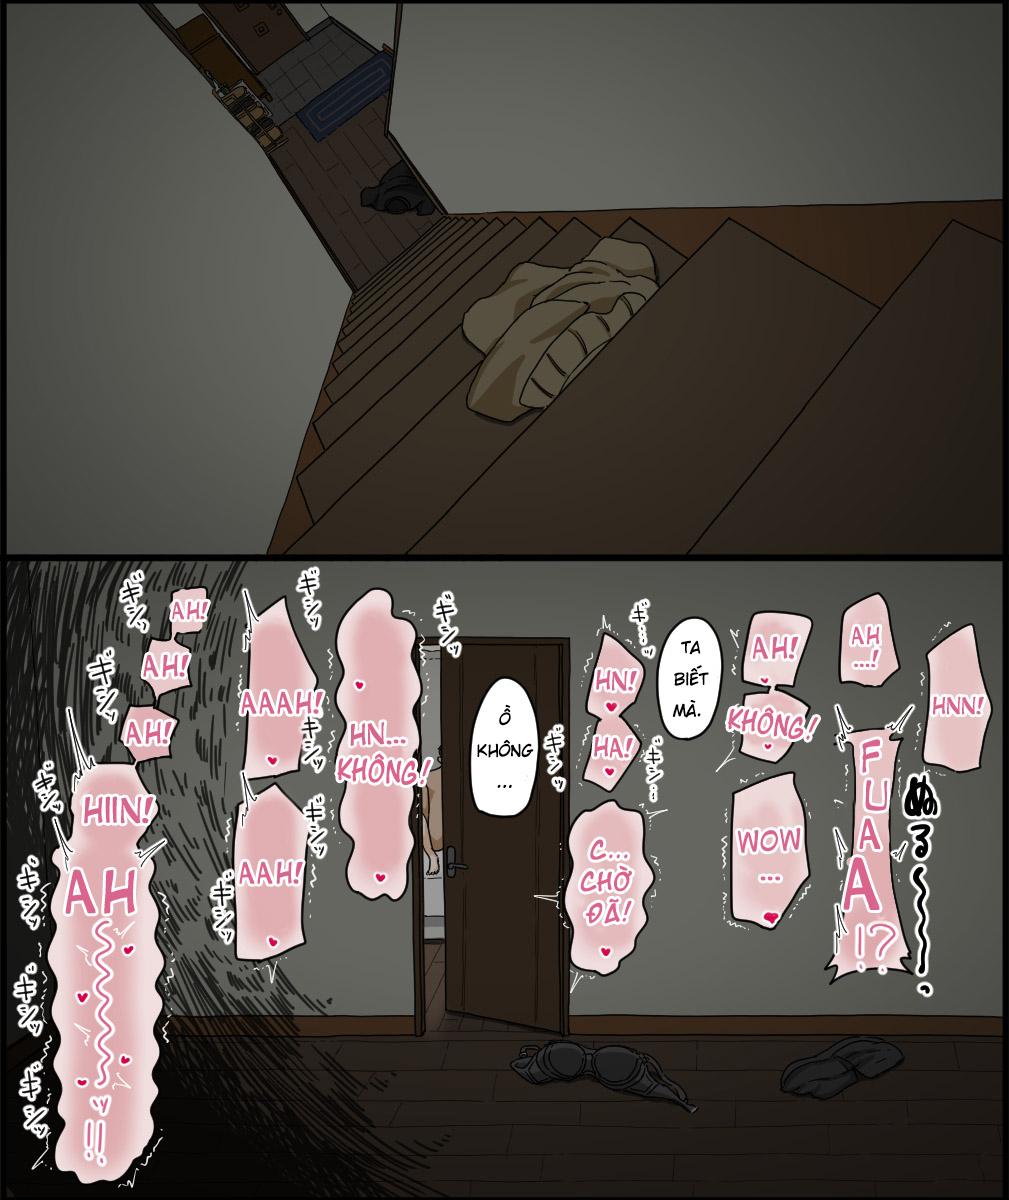 HentaiVN.net - Ảnh 41 - Sasaki Natsumi no Shikyuu ga Ochita Hi - 佐々木夏実の子宮が堕ちた日 - Full ( gộp 3 chap )